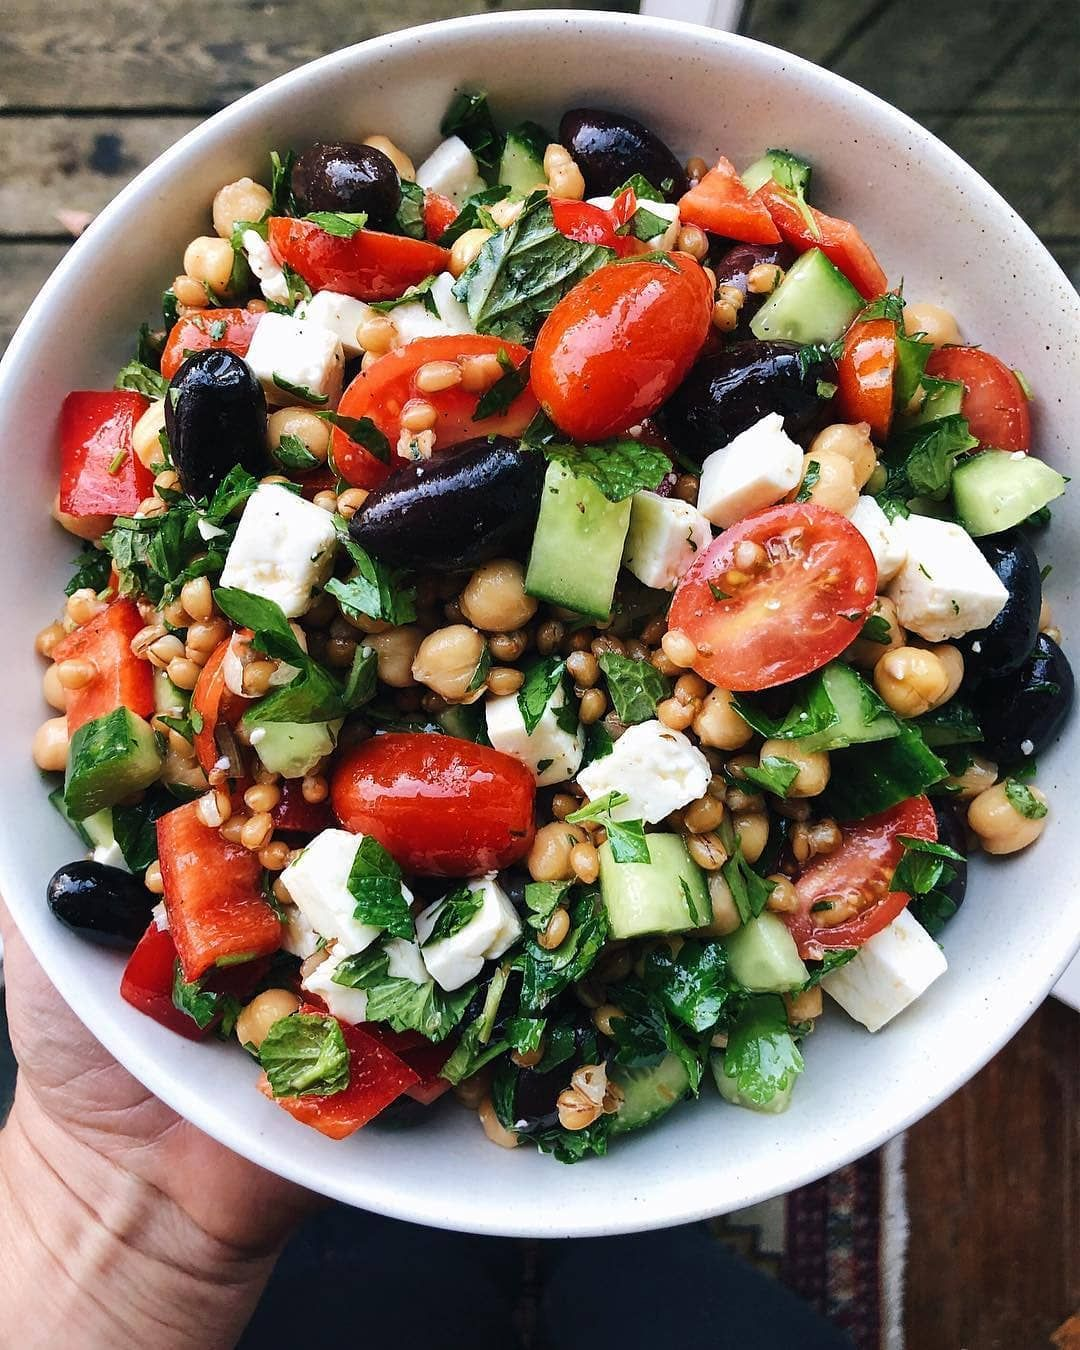 Healthy Vegan Recipes On Instagram Greek Wheat Berry